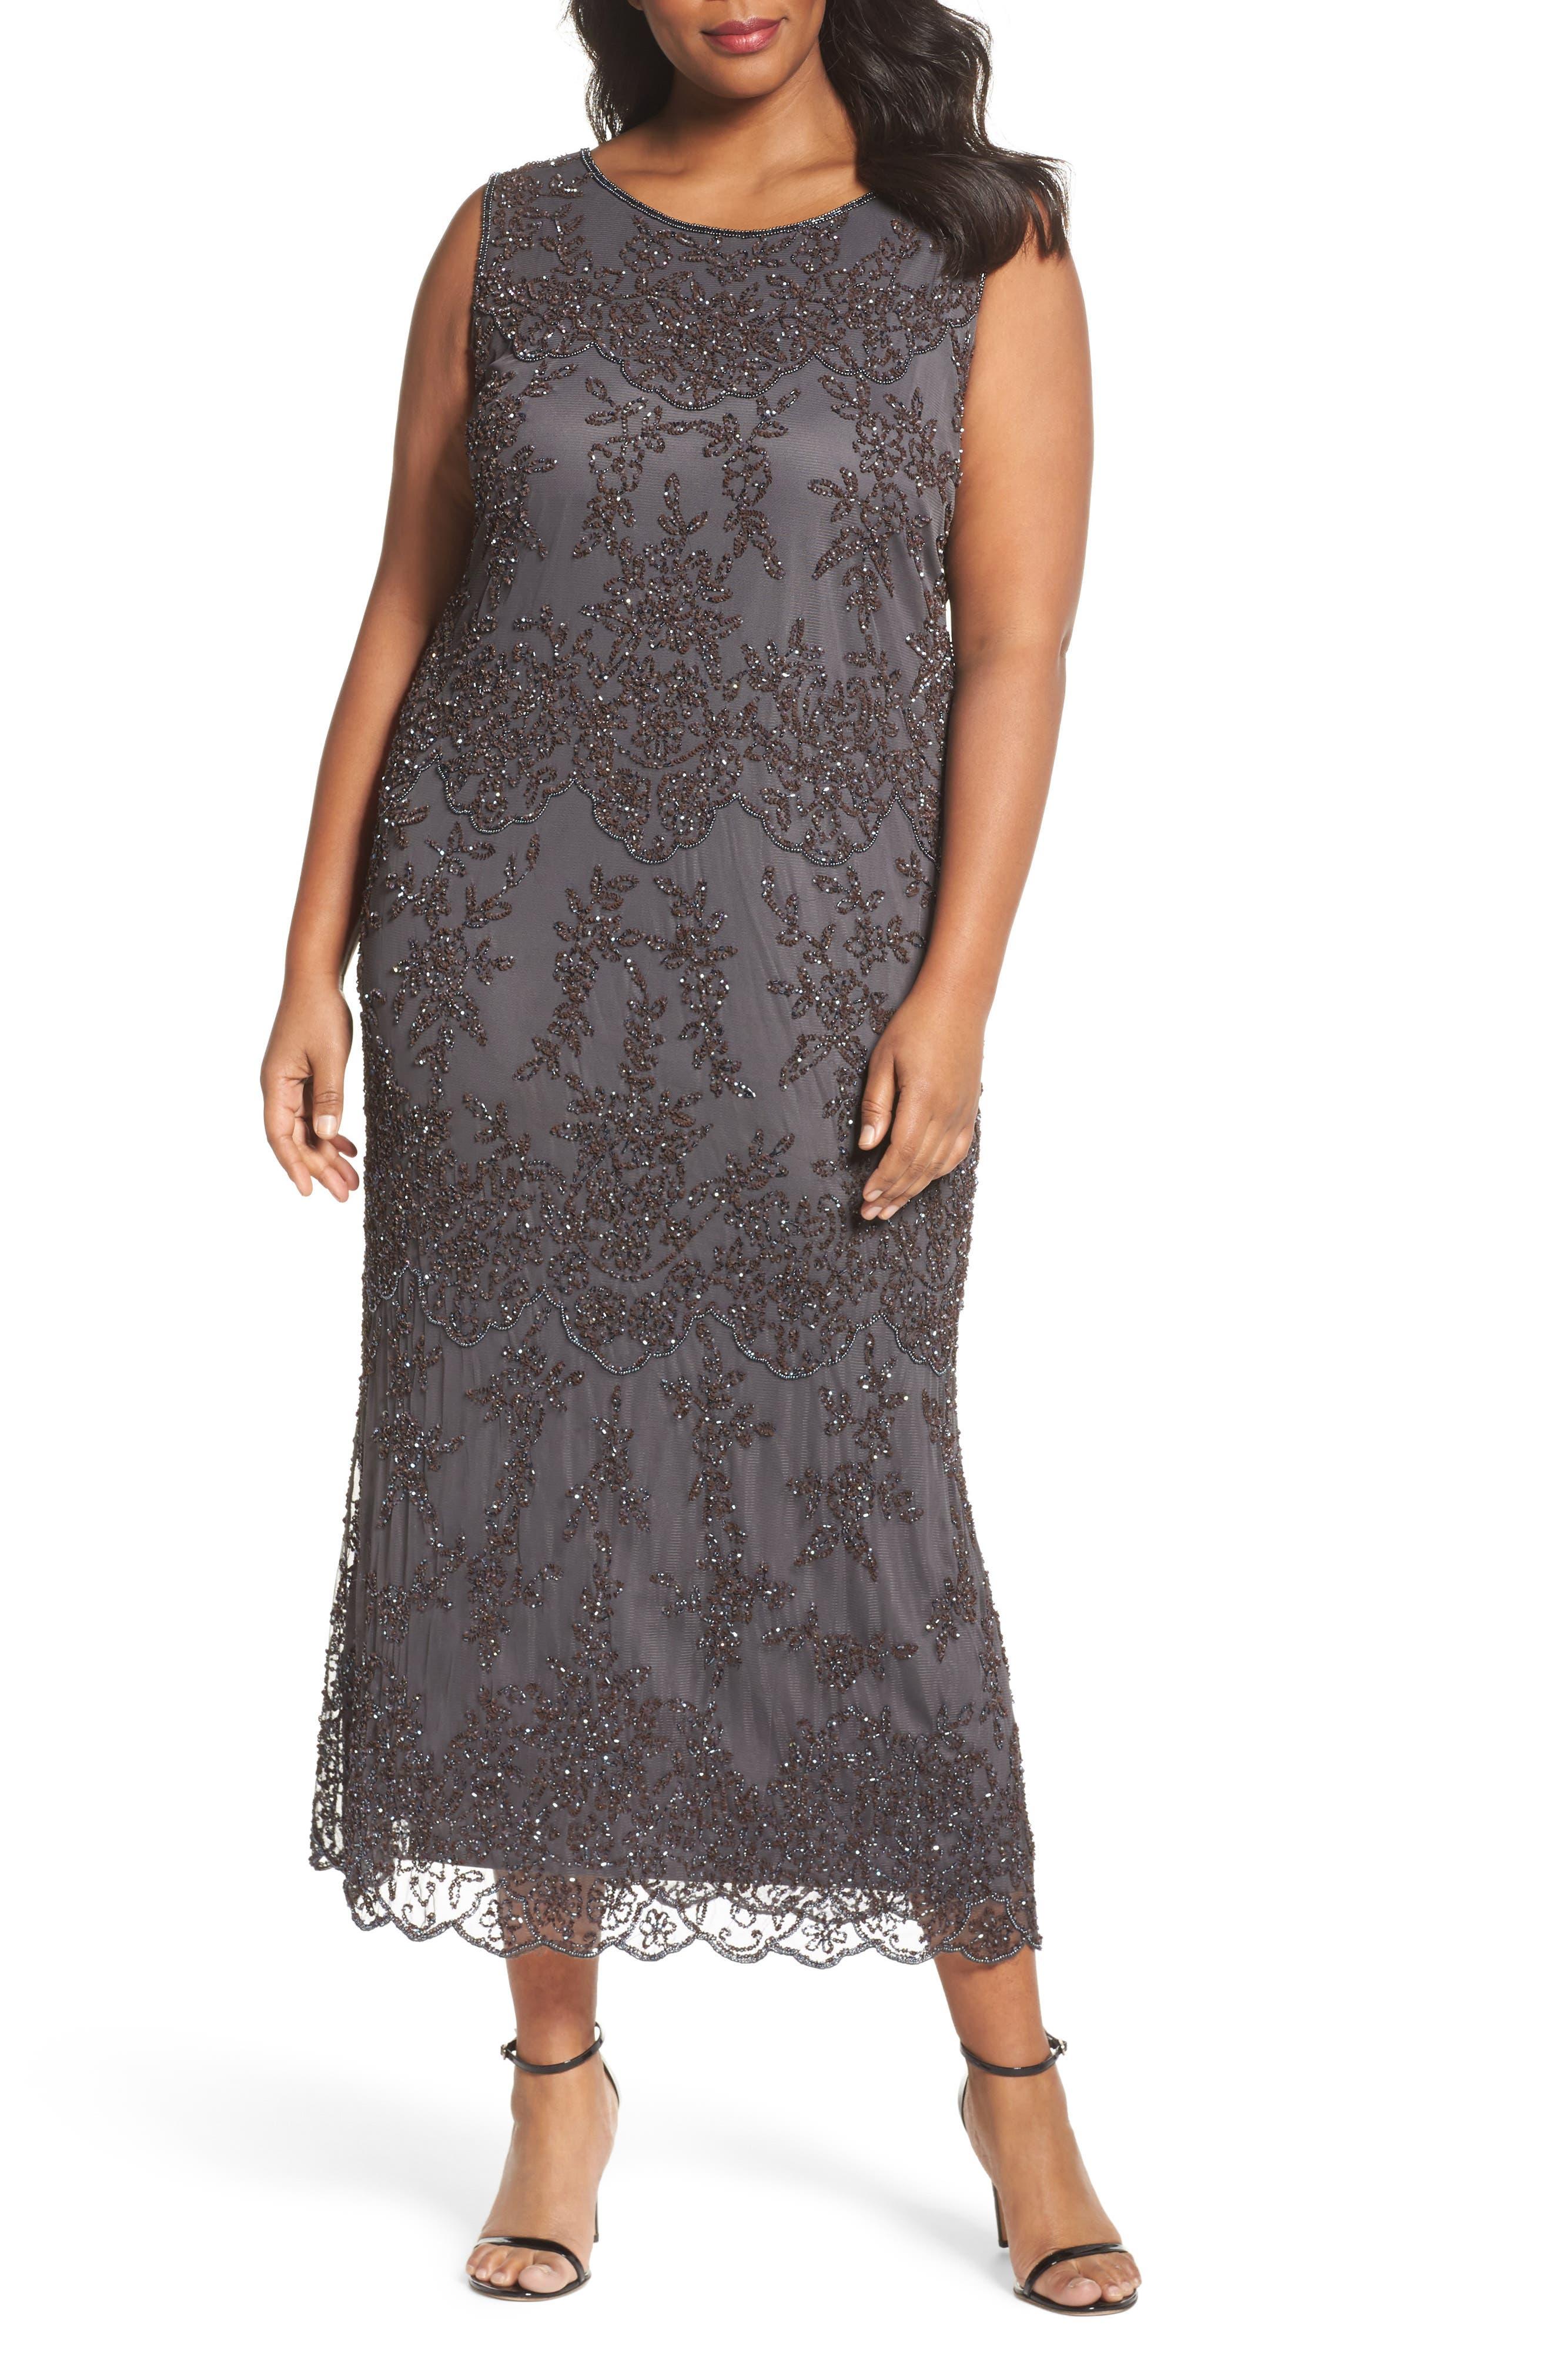 Alternate Image 1 Selected - Pisarro Nights Embellished Bateau Neck Long Dress (Plus Size)